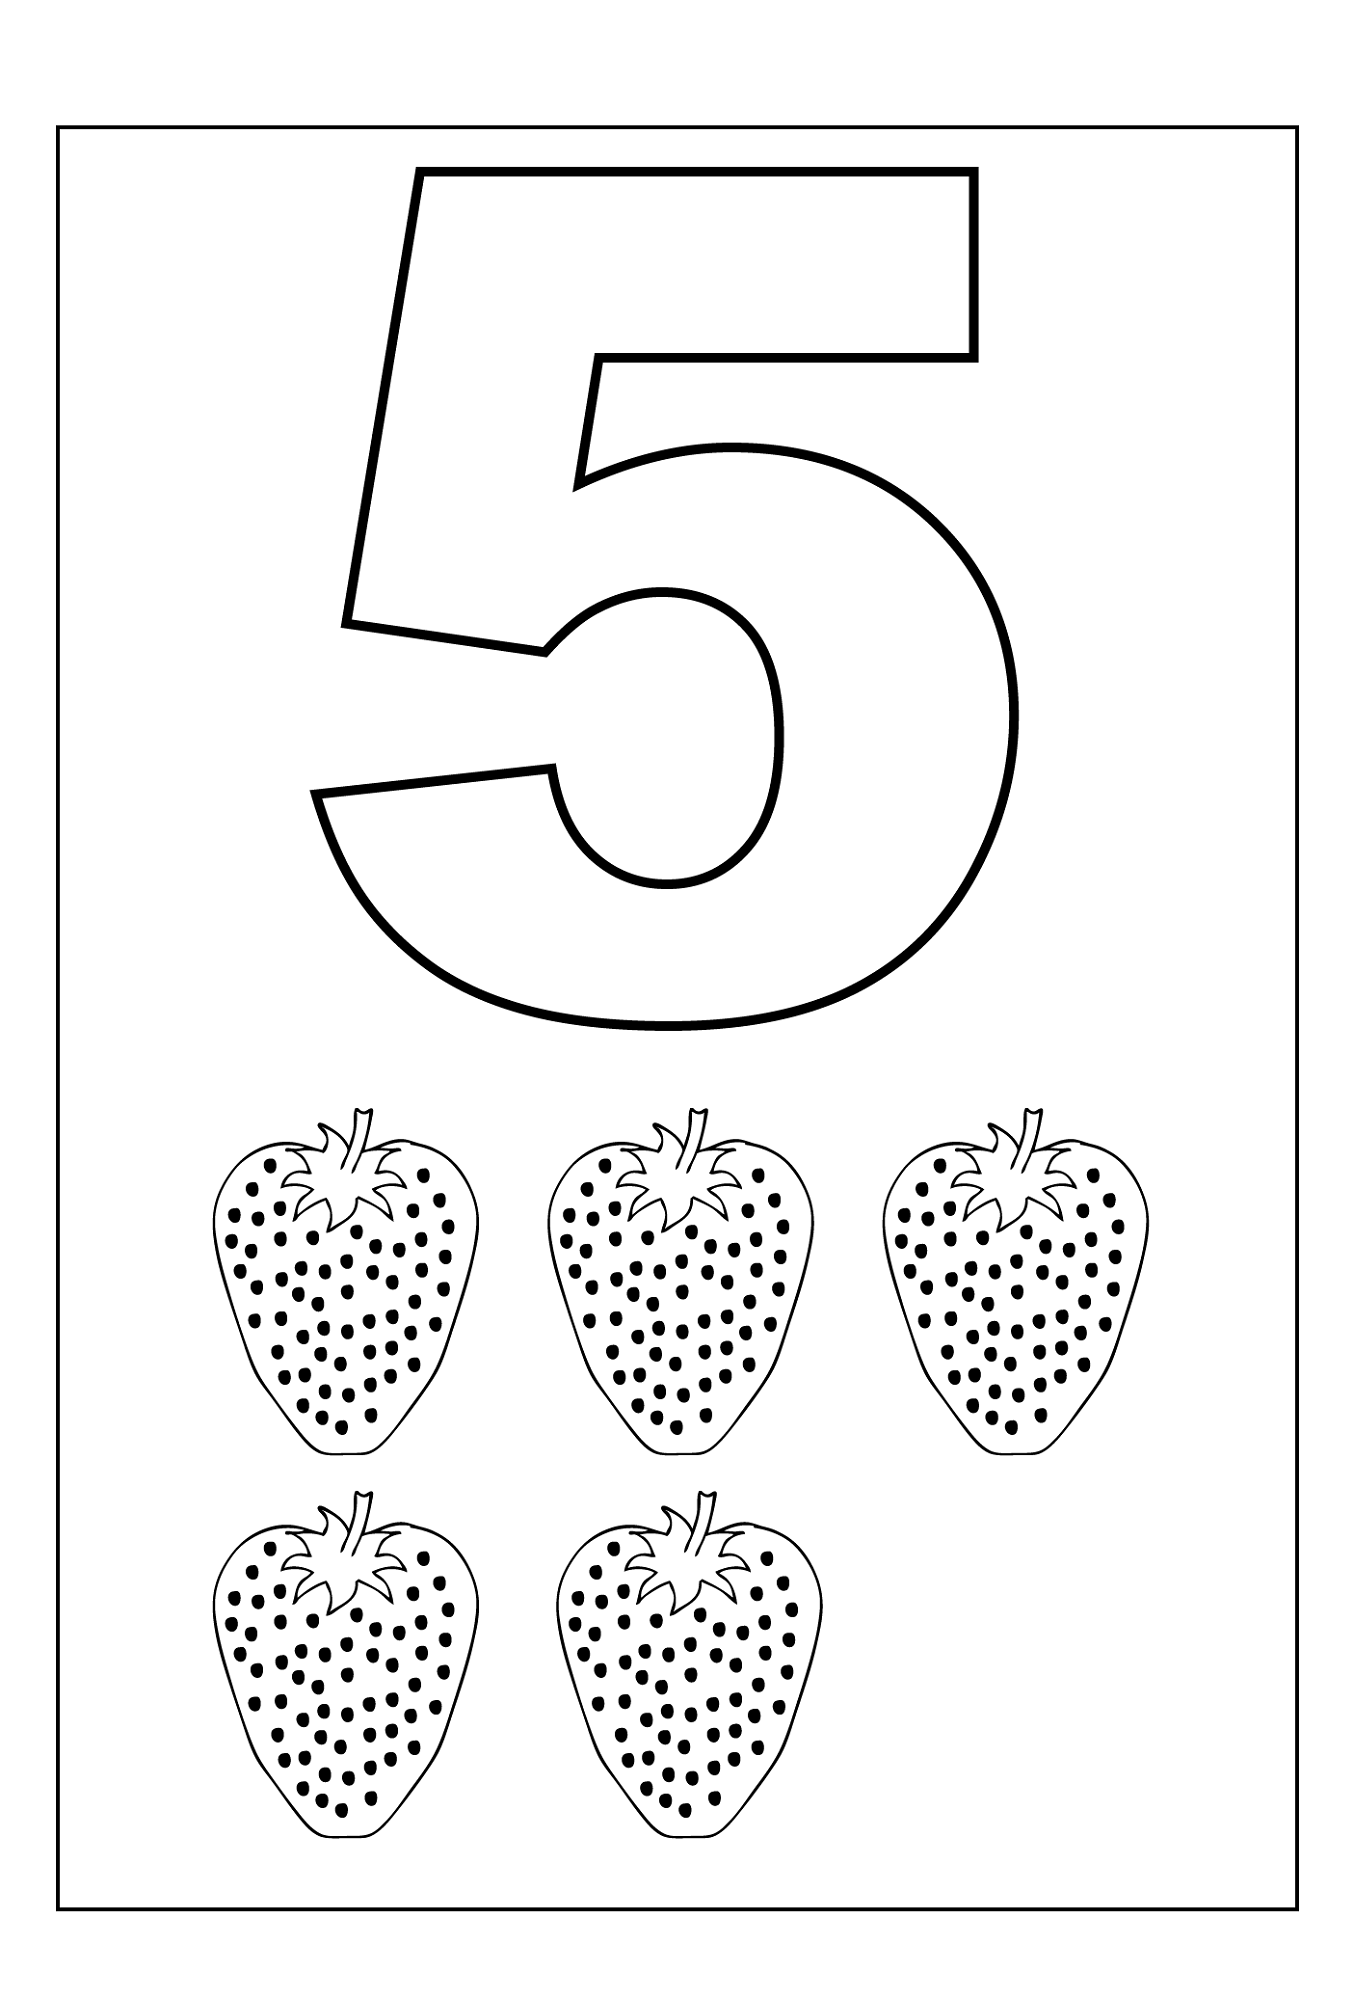 picture of number 5 for kindergarten